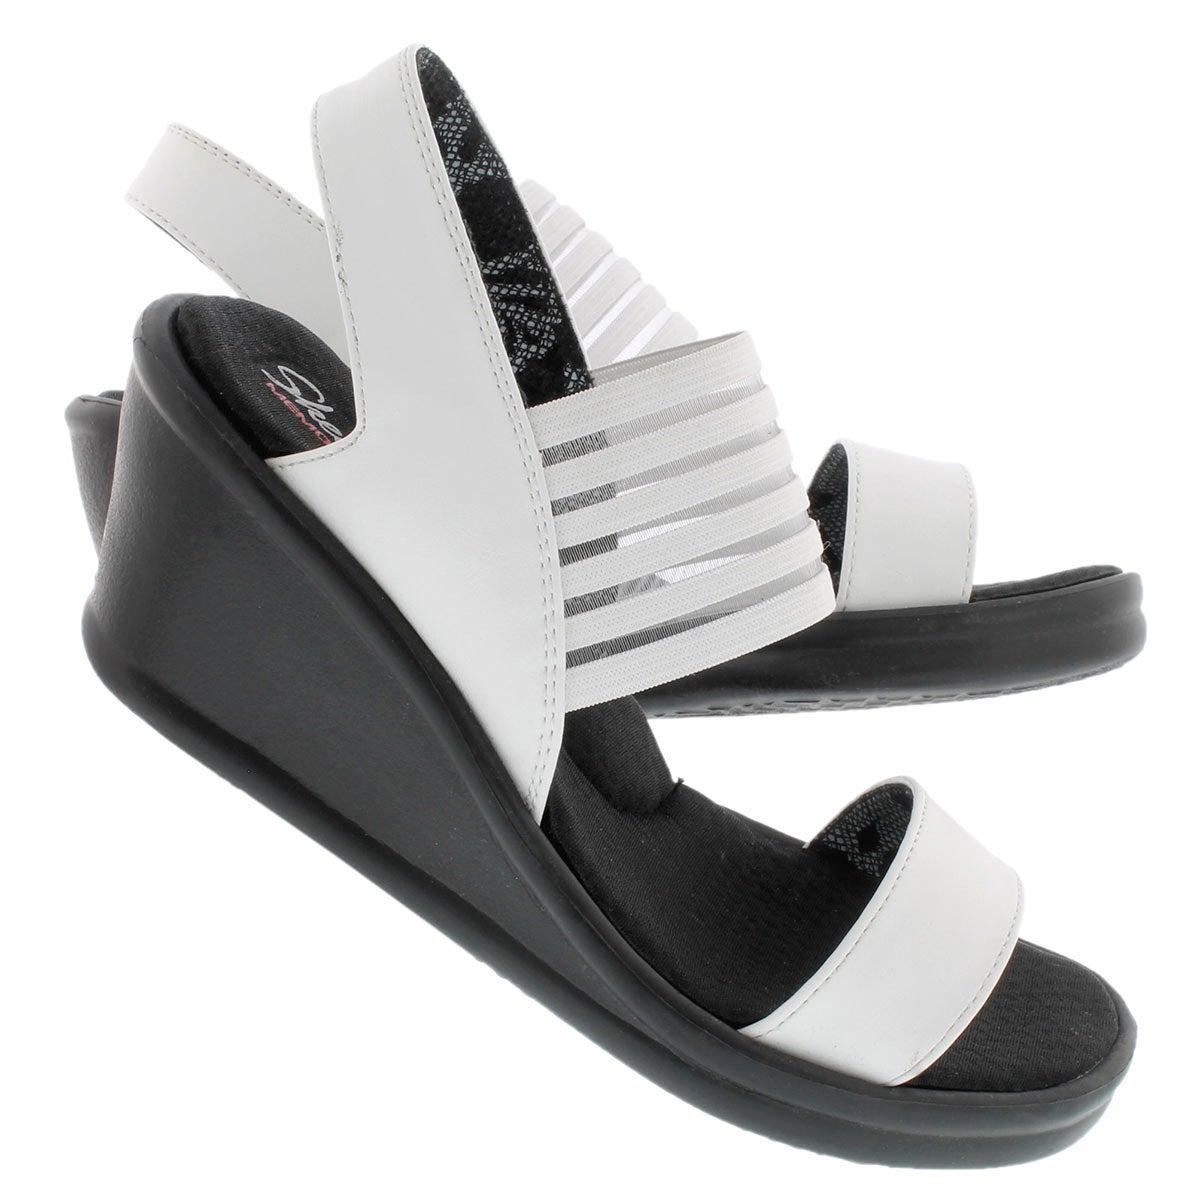 Sandale comp blanc SCI-FI, fem